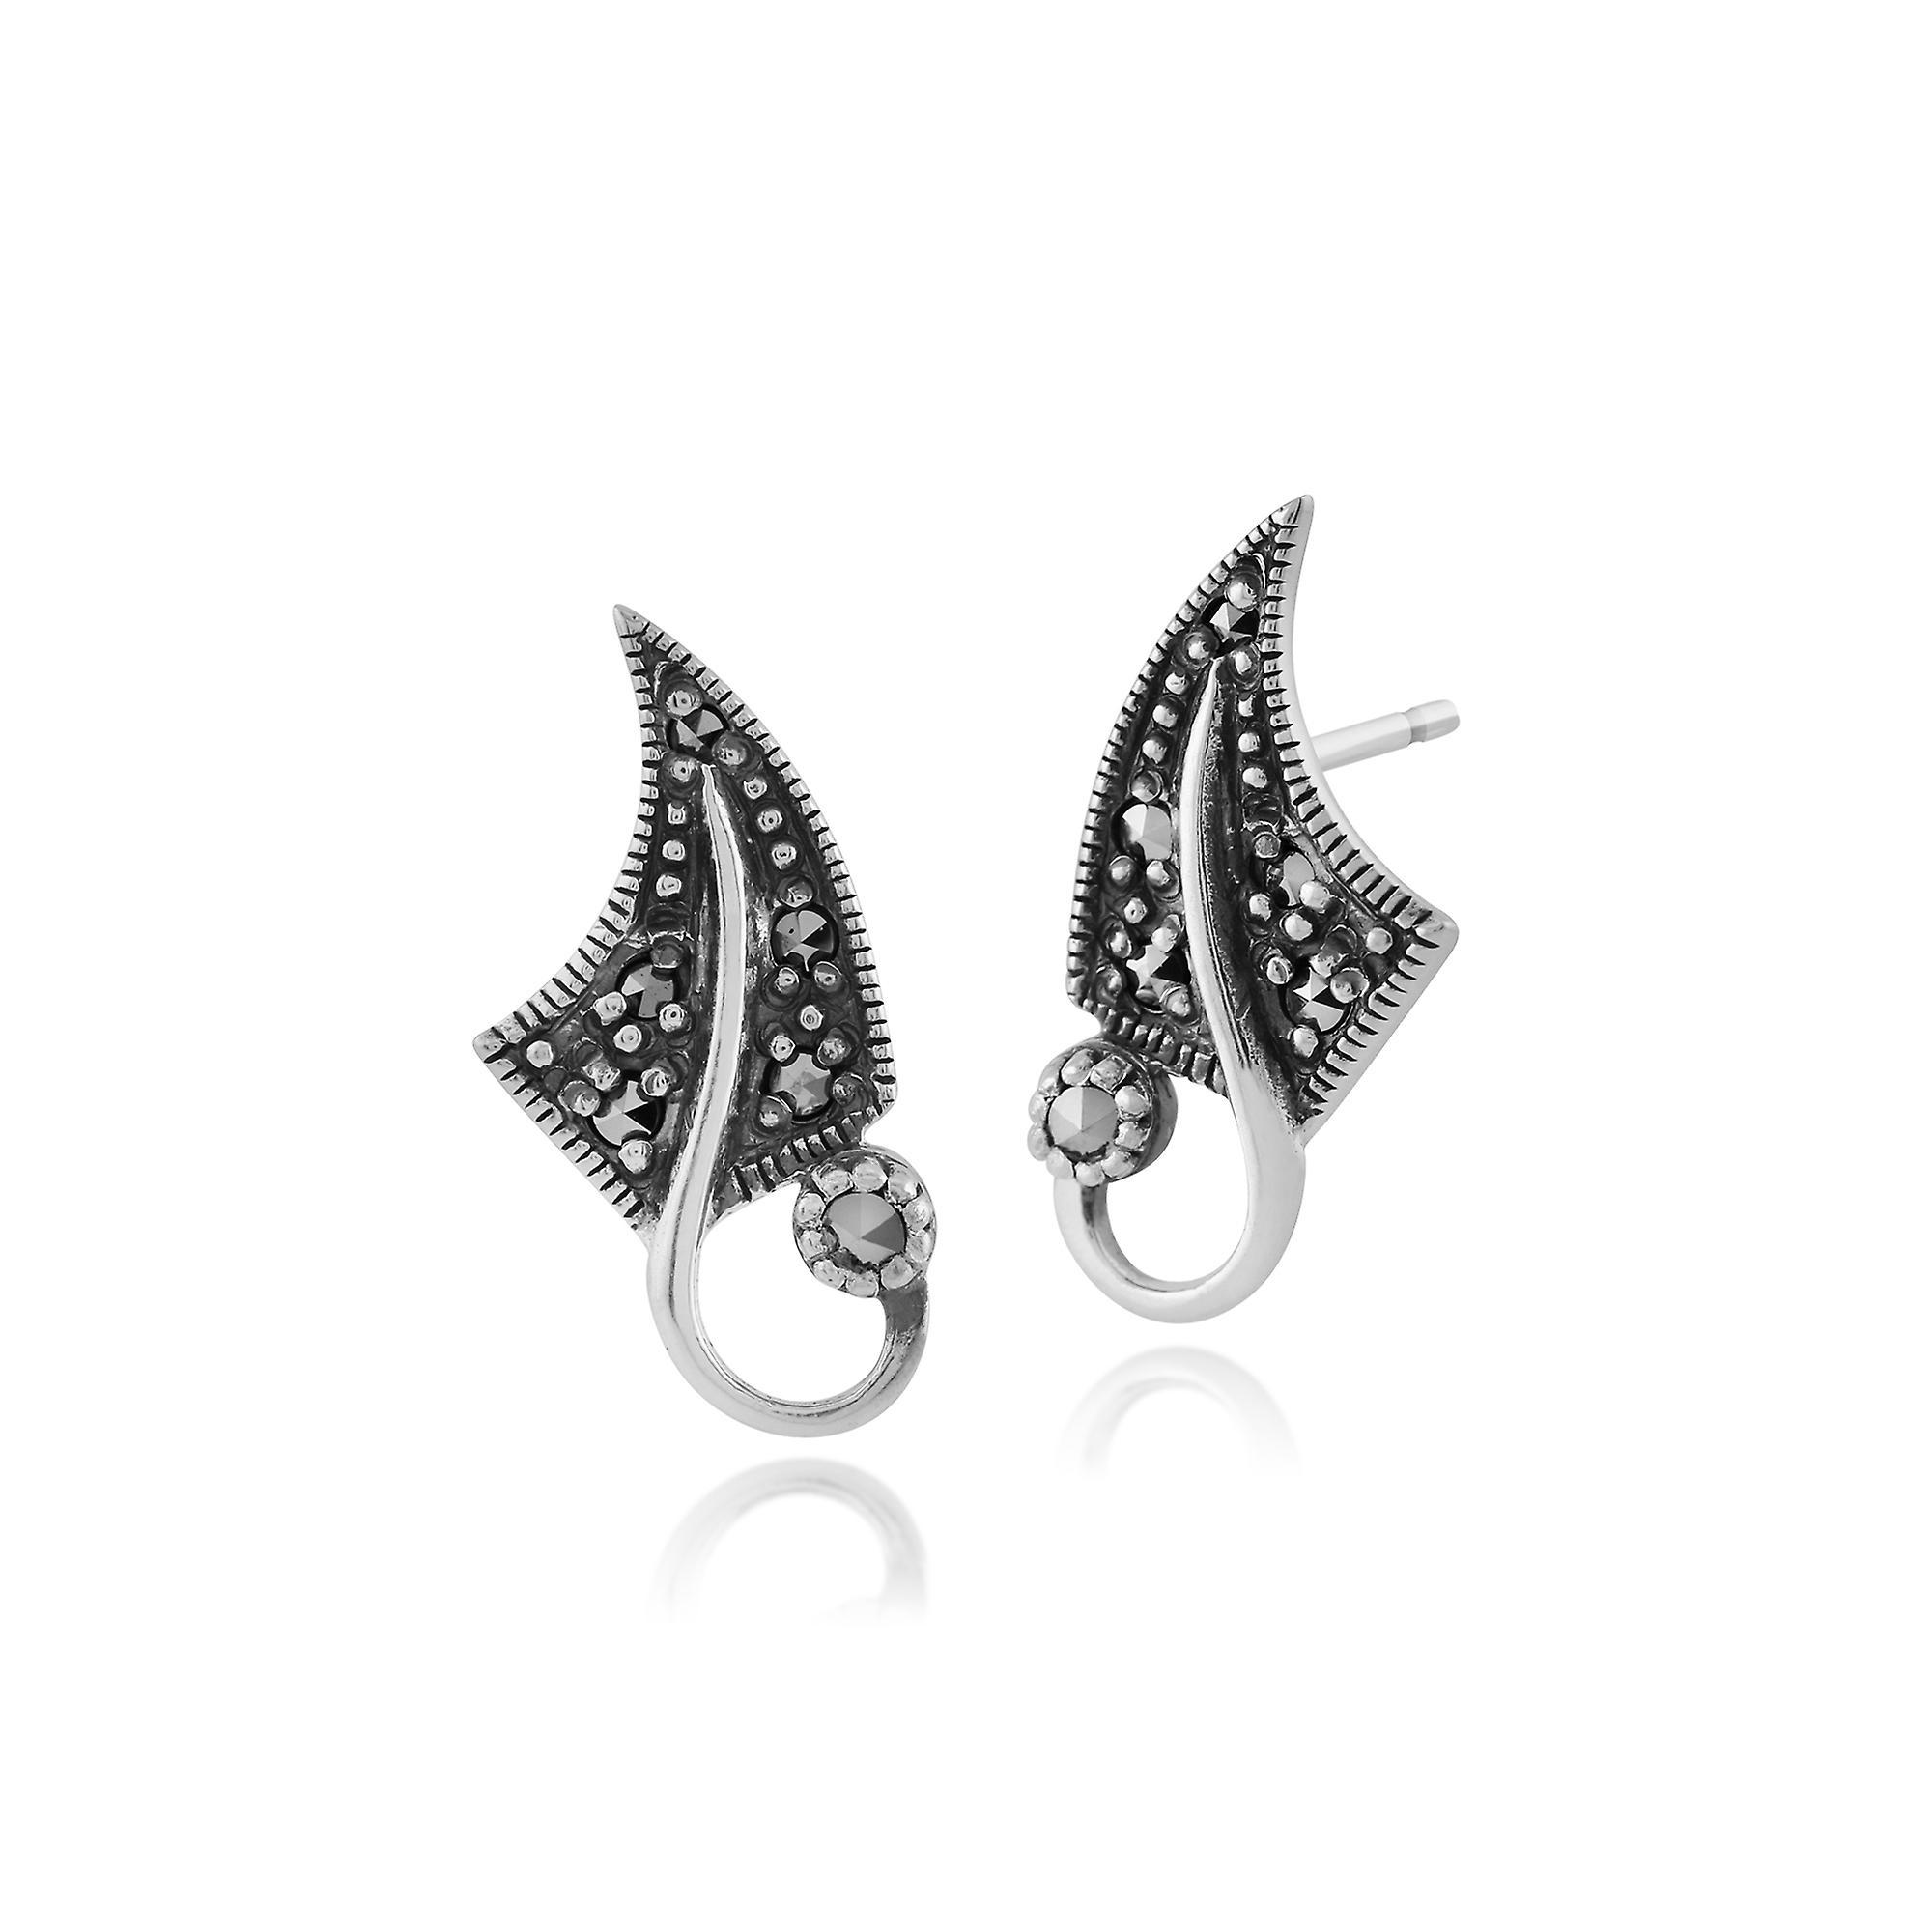 Gemondo Sterling Silver 0.17ct Marcasite Art Nouveau Leaf Design Stud Earrings